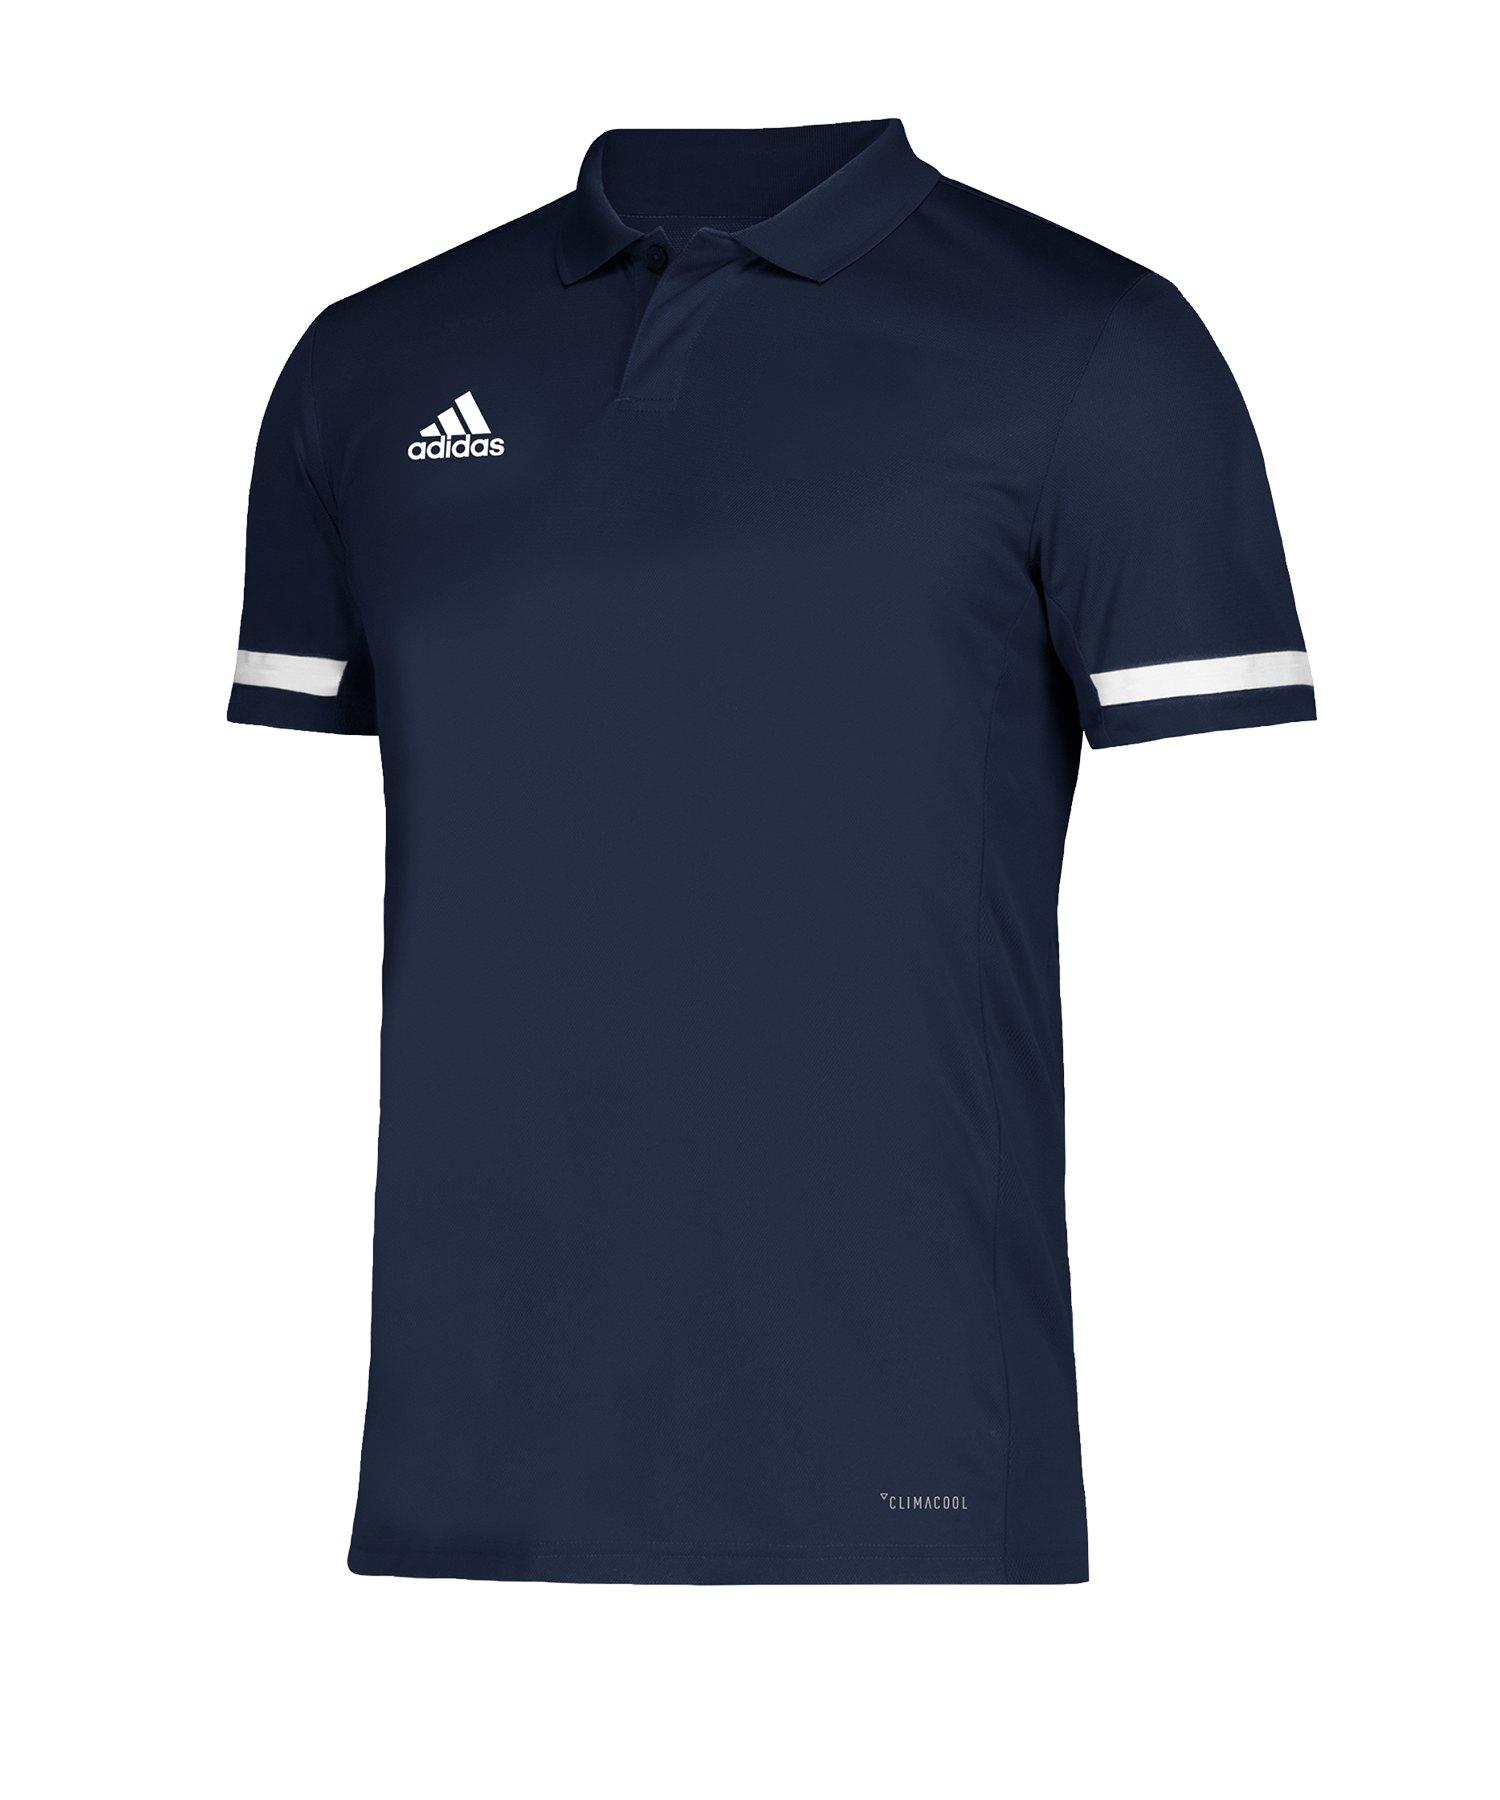 adidas Team 19 Poloshirt Blau Weiss - blau